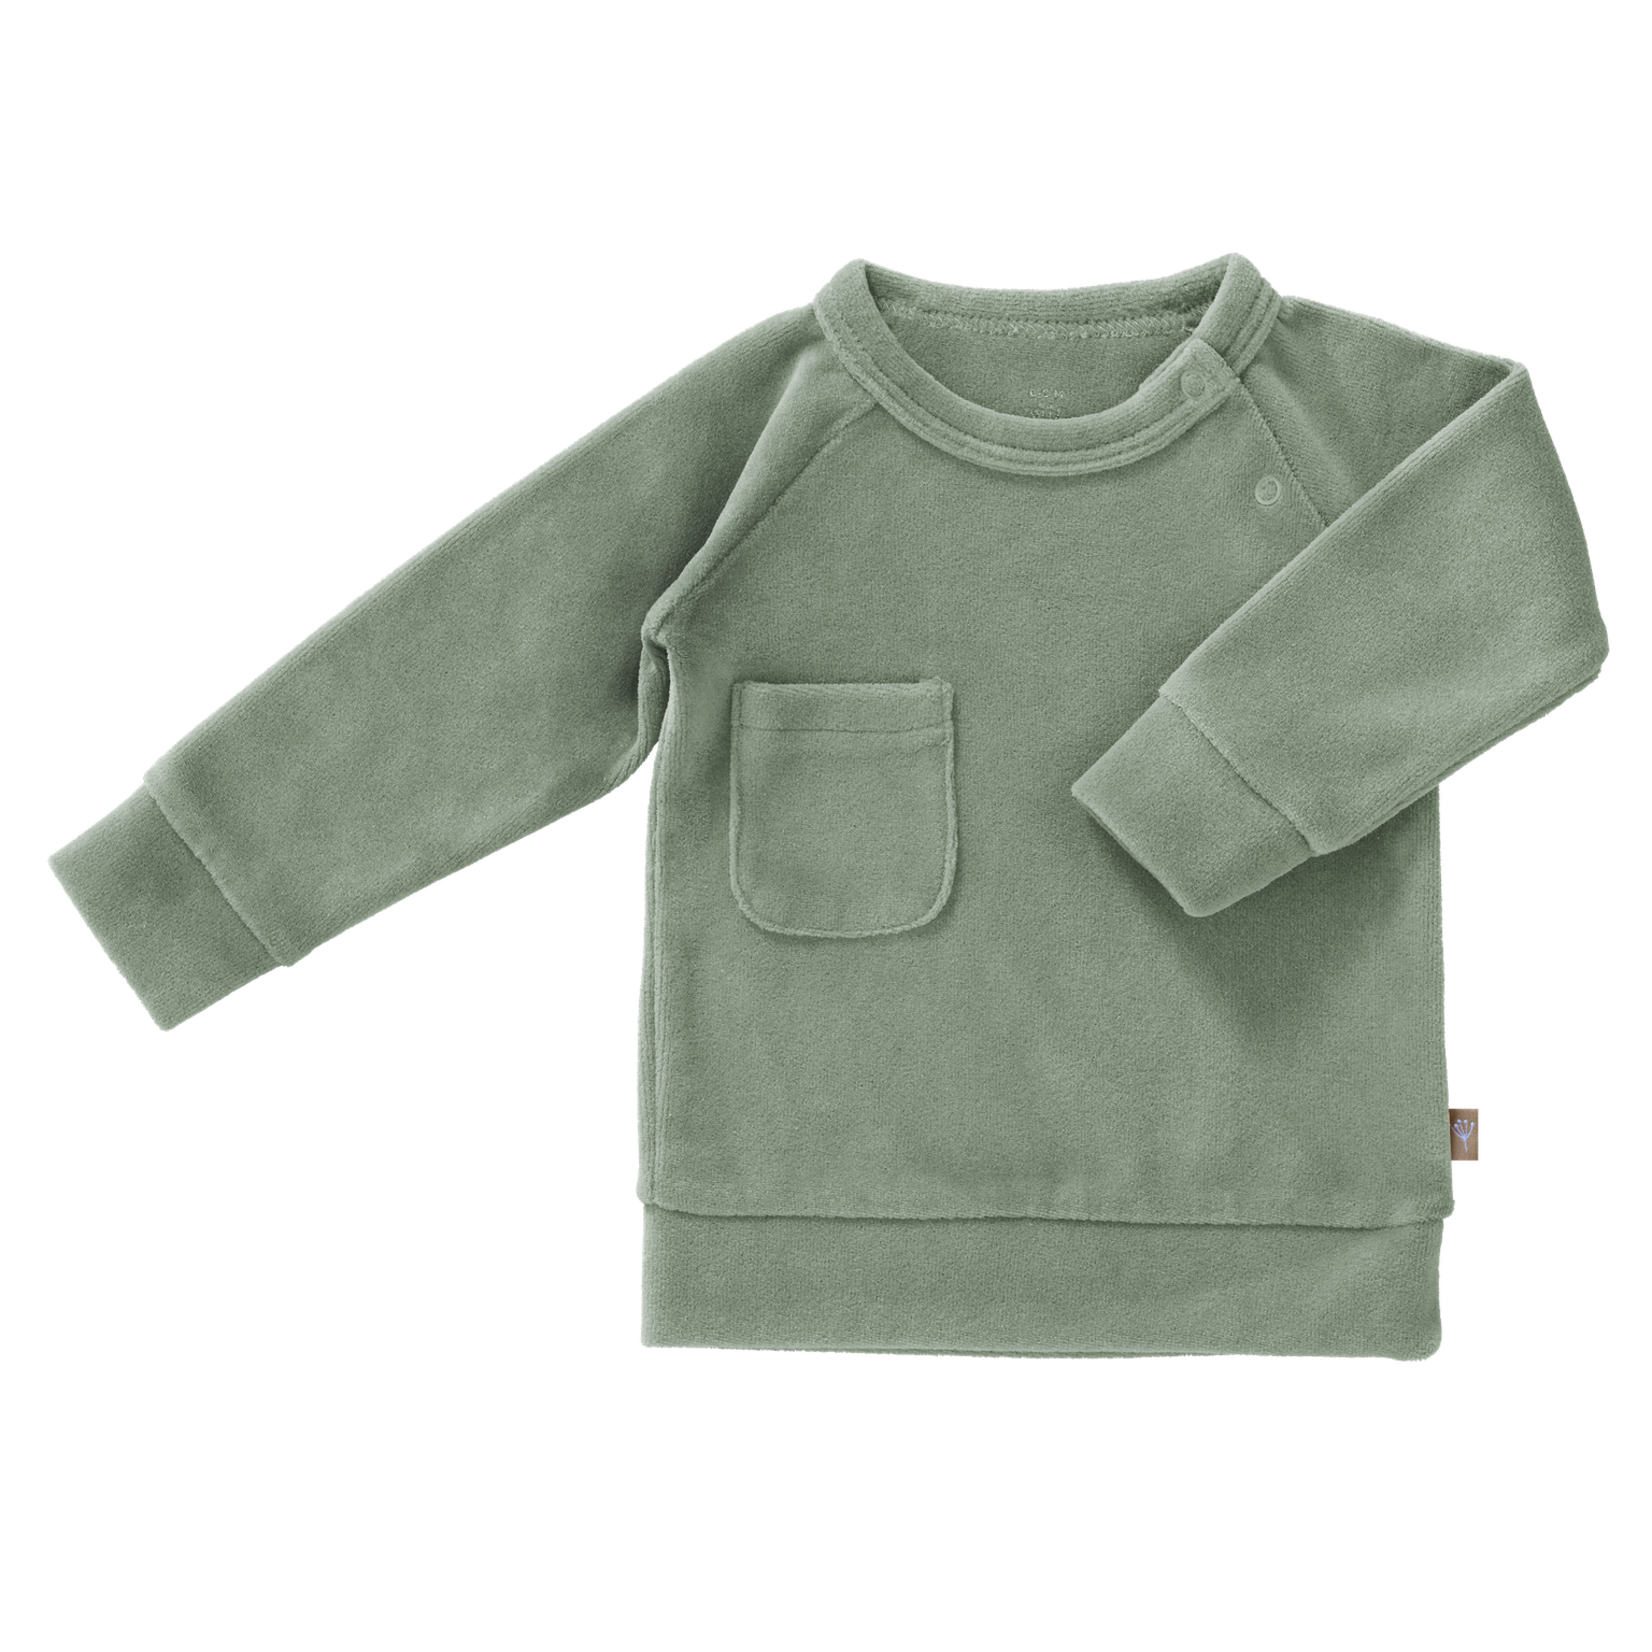 Fresk Sweater velours (Forest green)